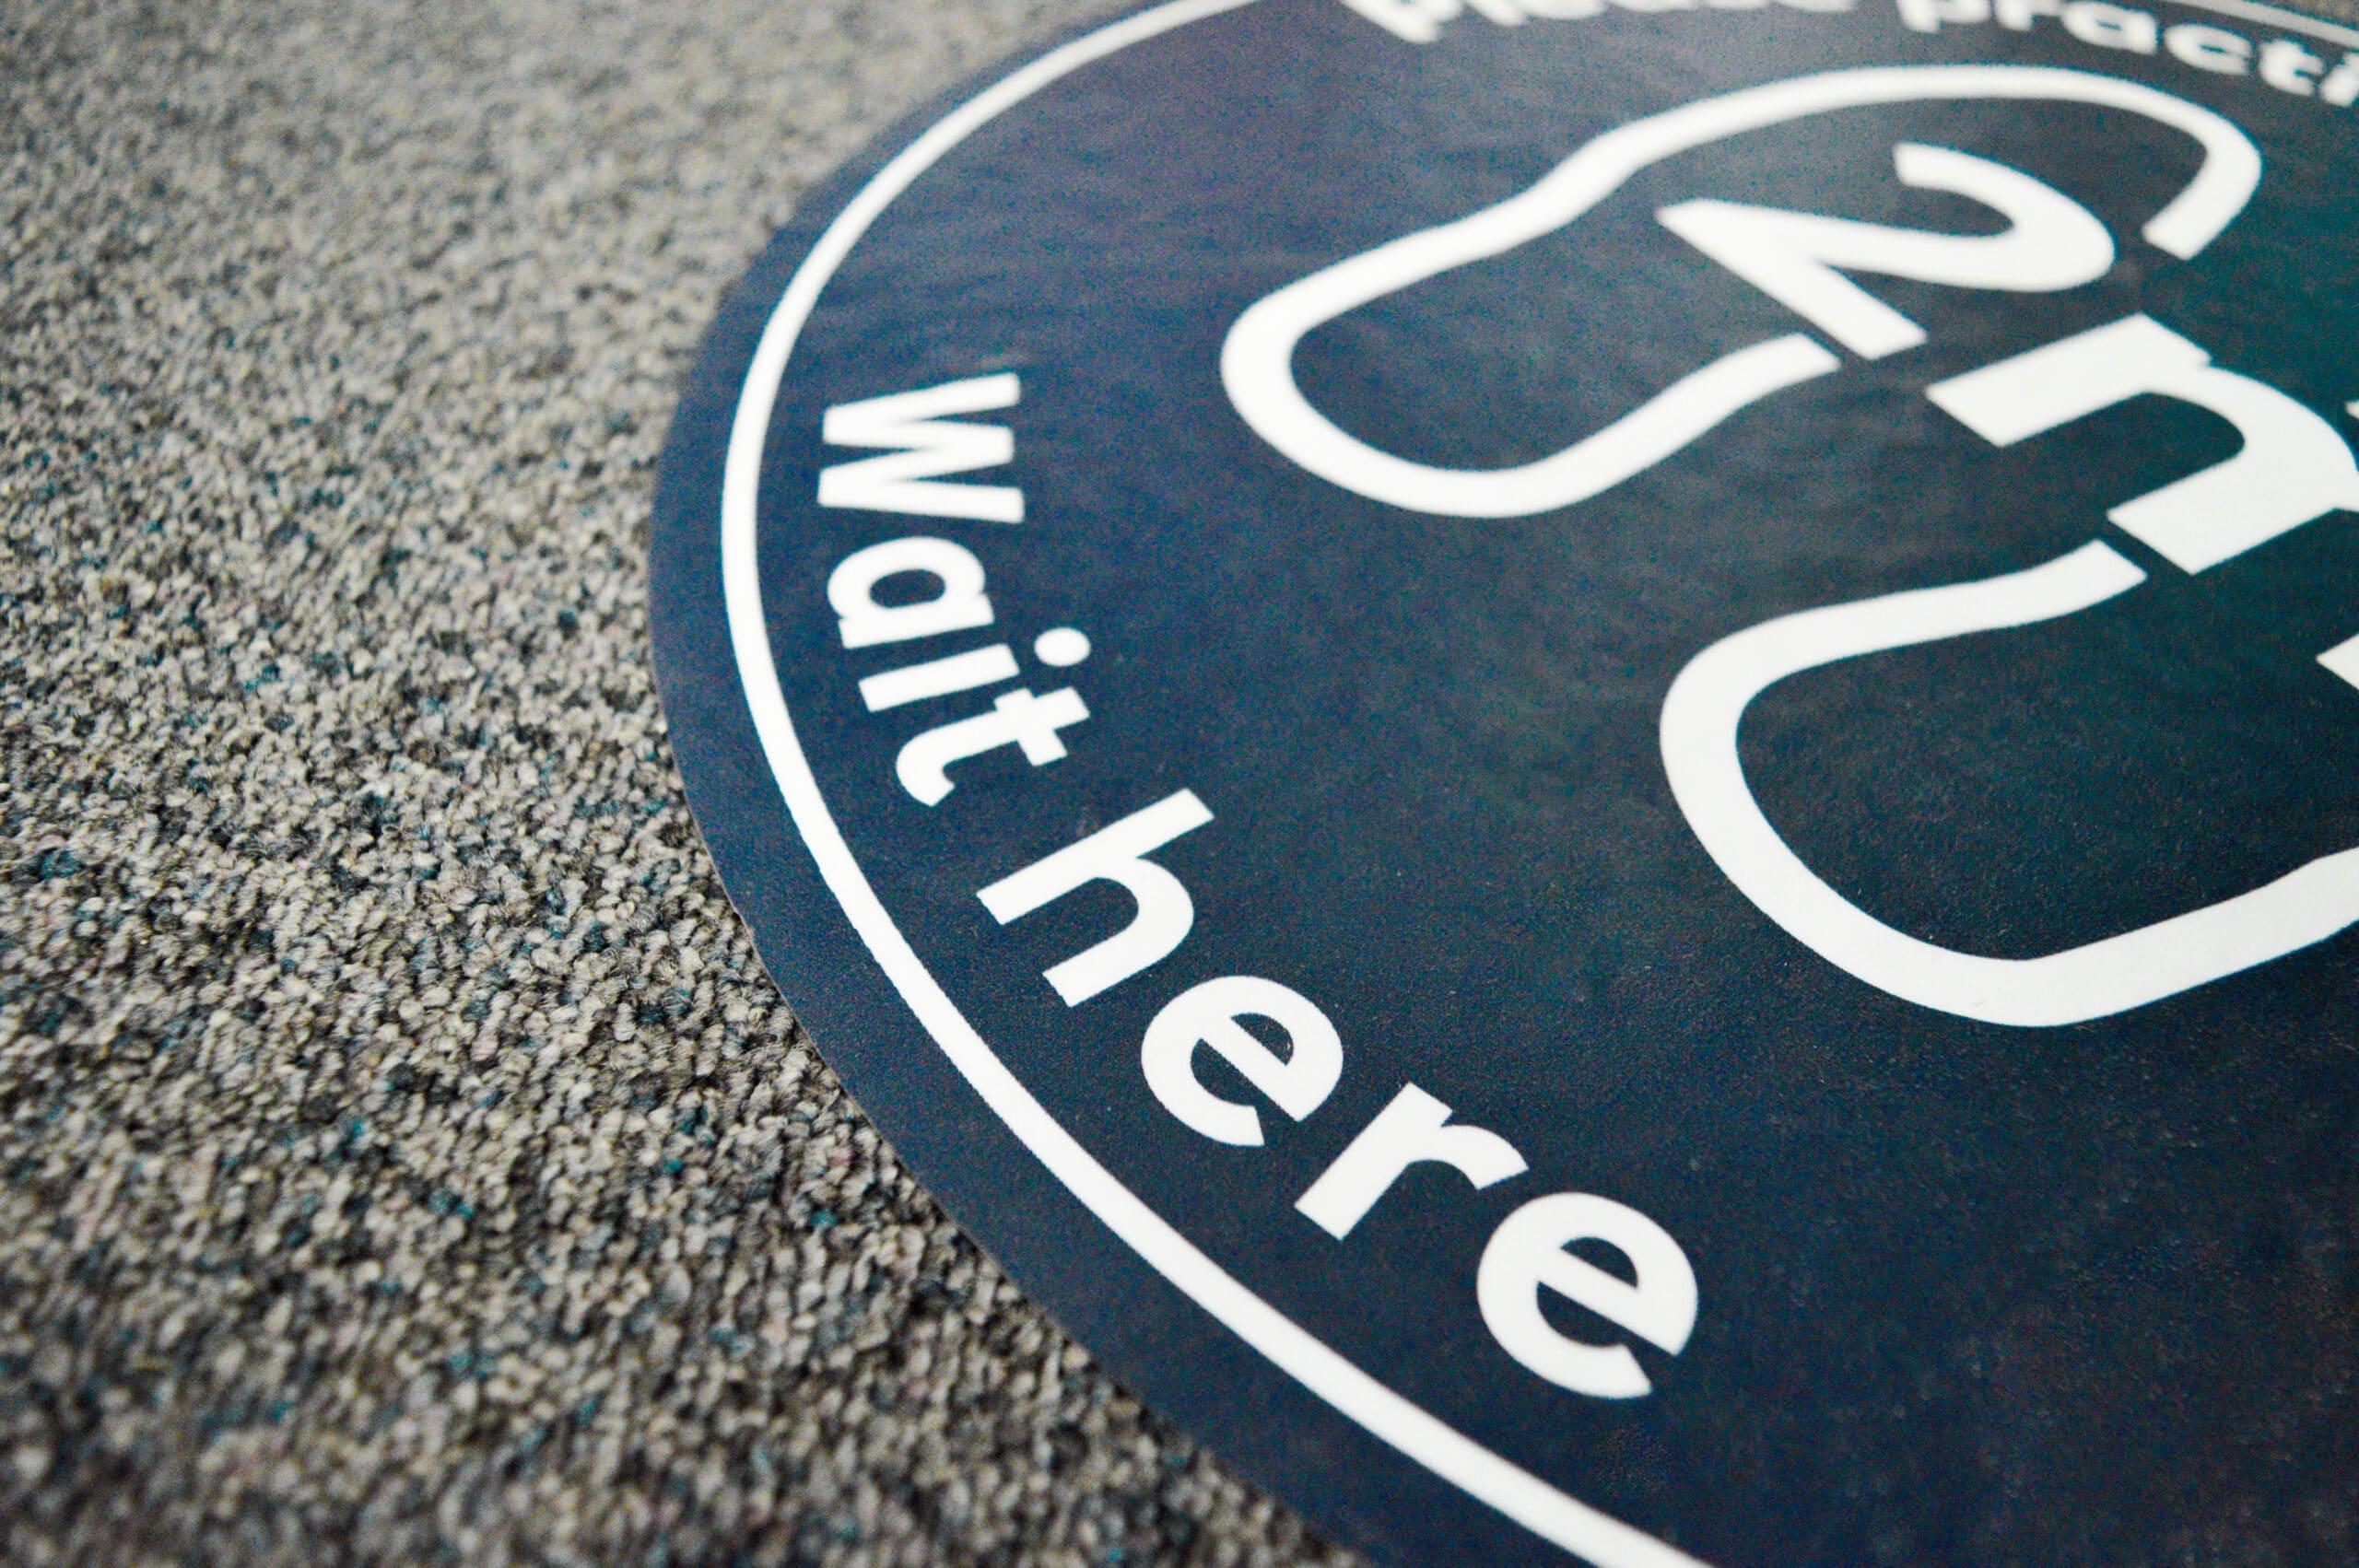 printed floor graphics